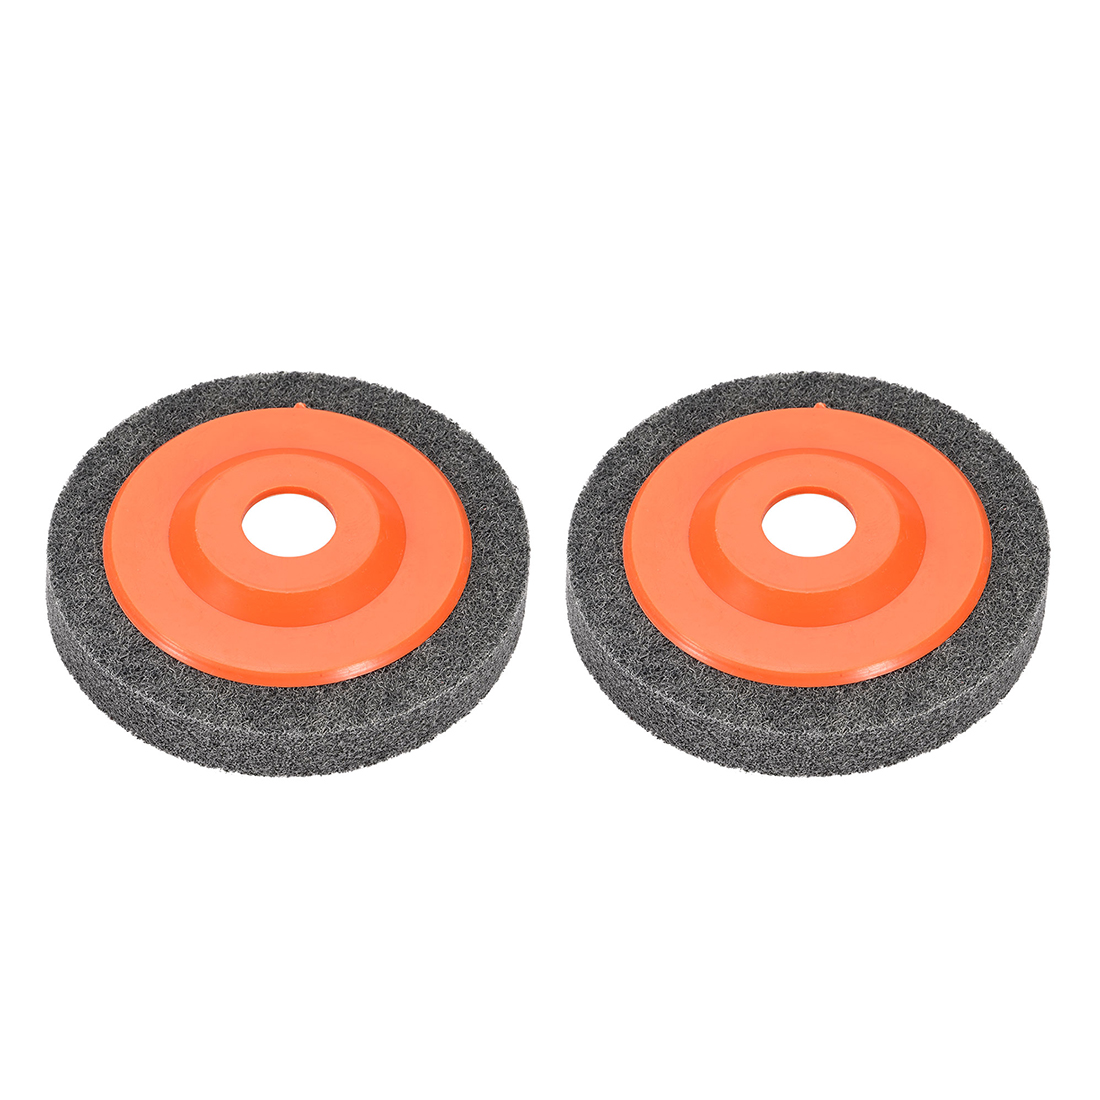 4.5 Inch Polishing Wheel Buffing Pad Disc for 100 Angle Grinders Orange 2pcs